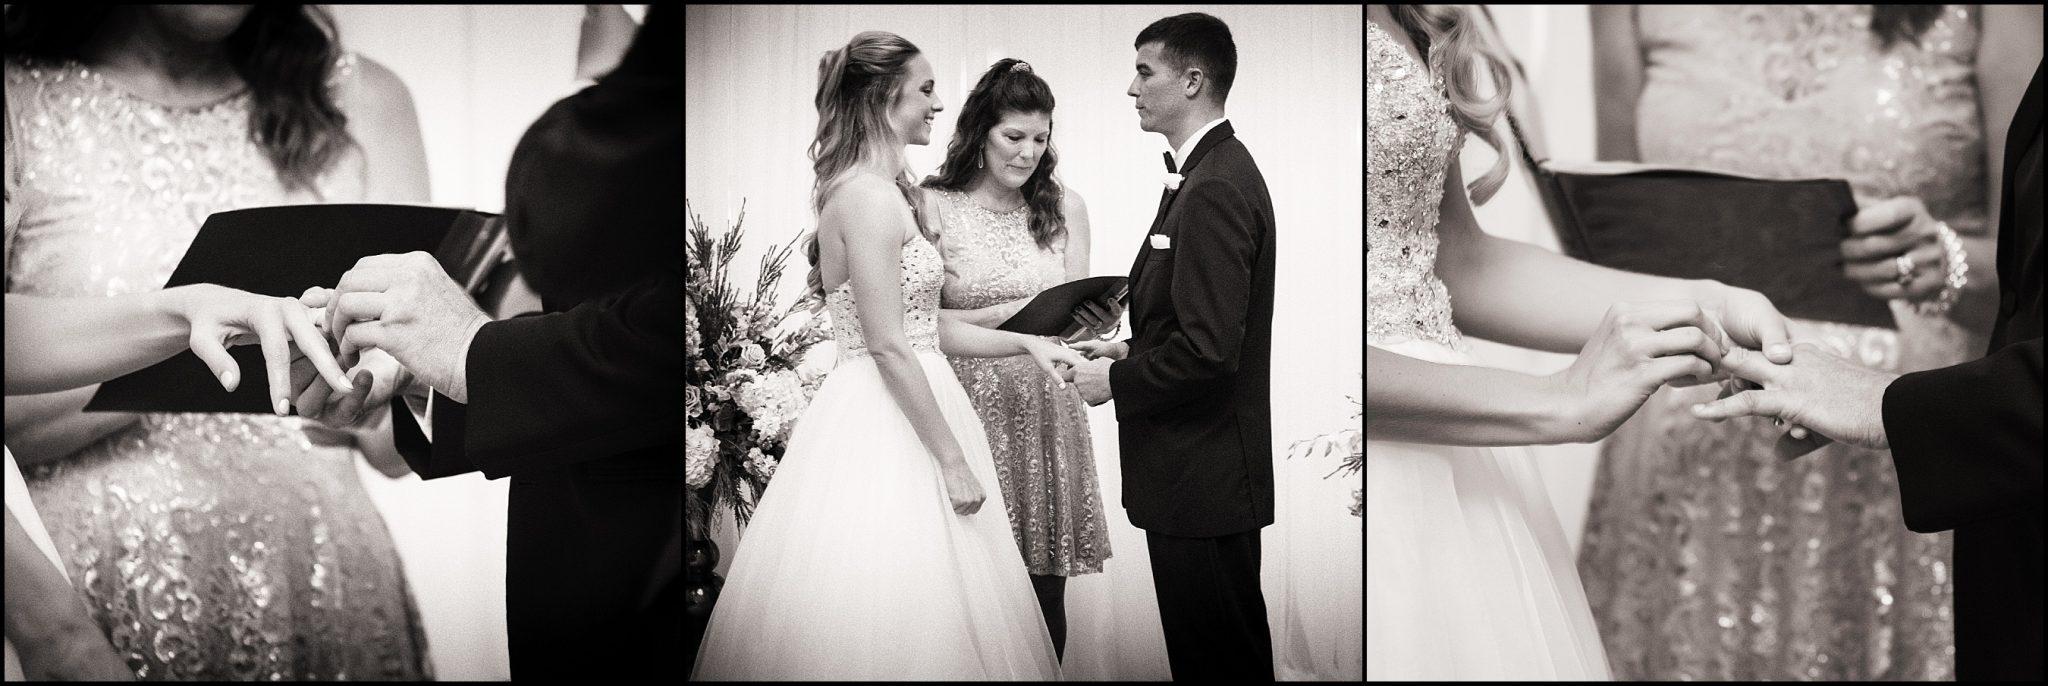 wedding ceremony dunegrass golf club